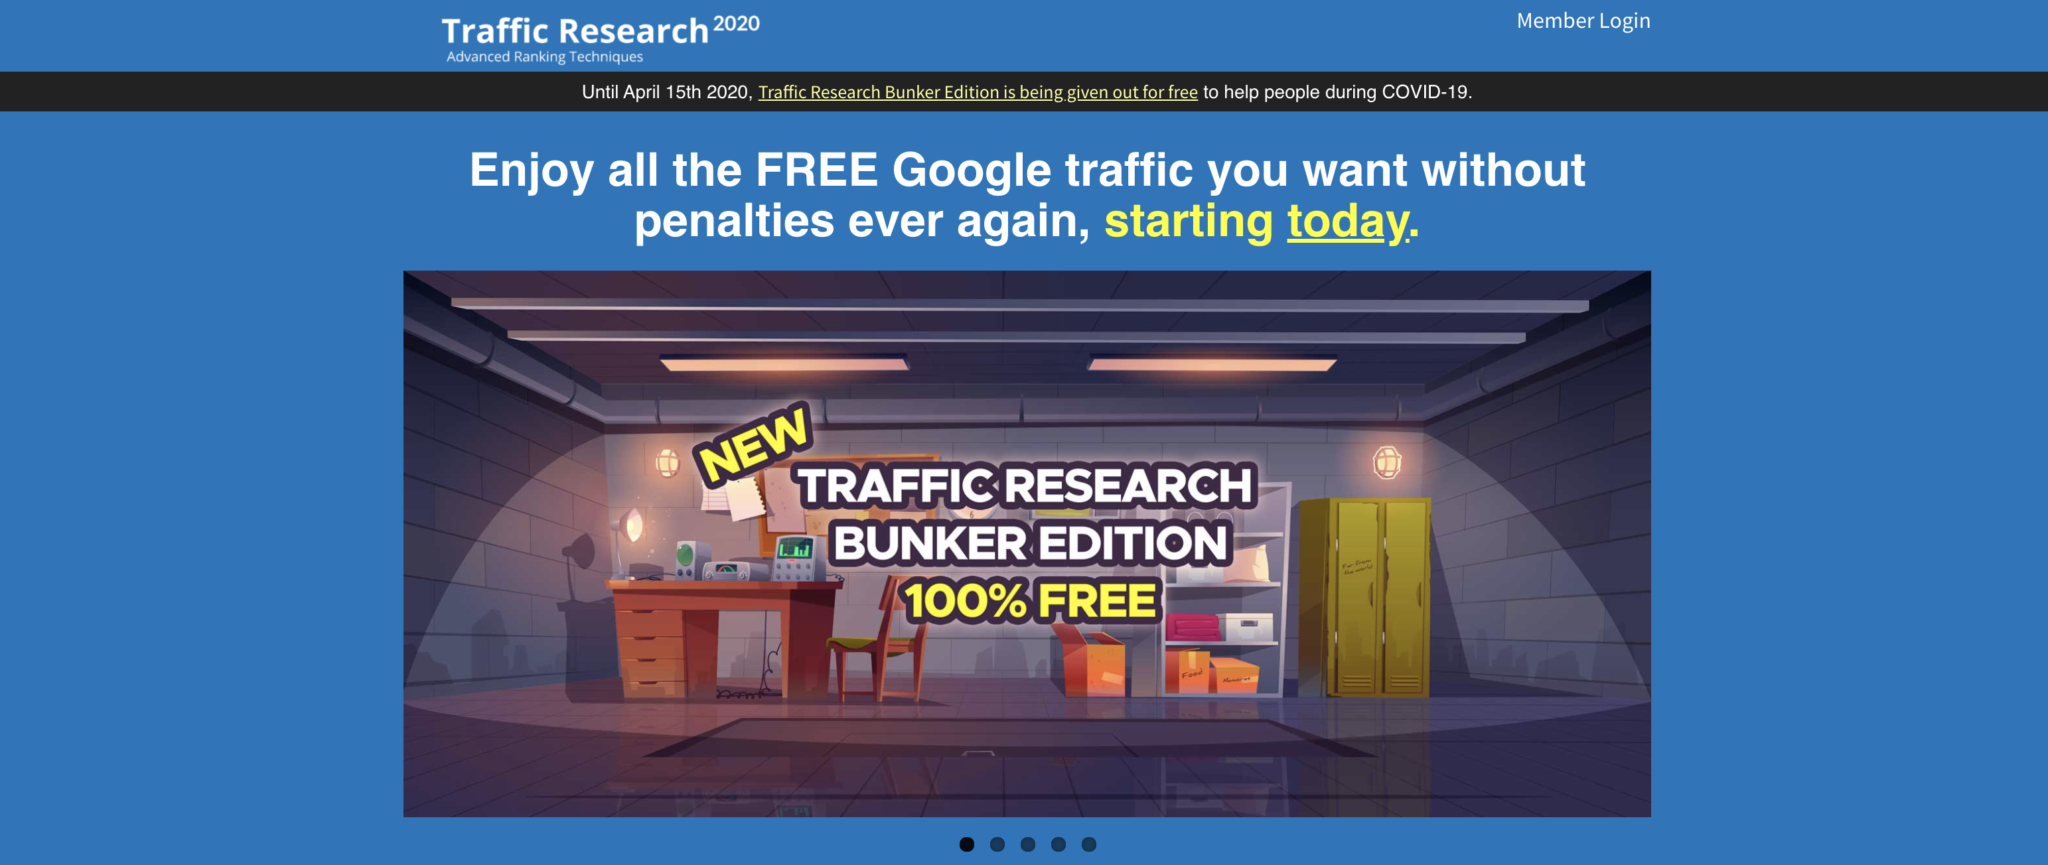 my-traffic-research